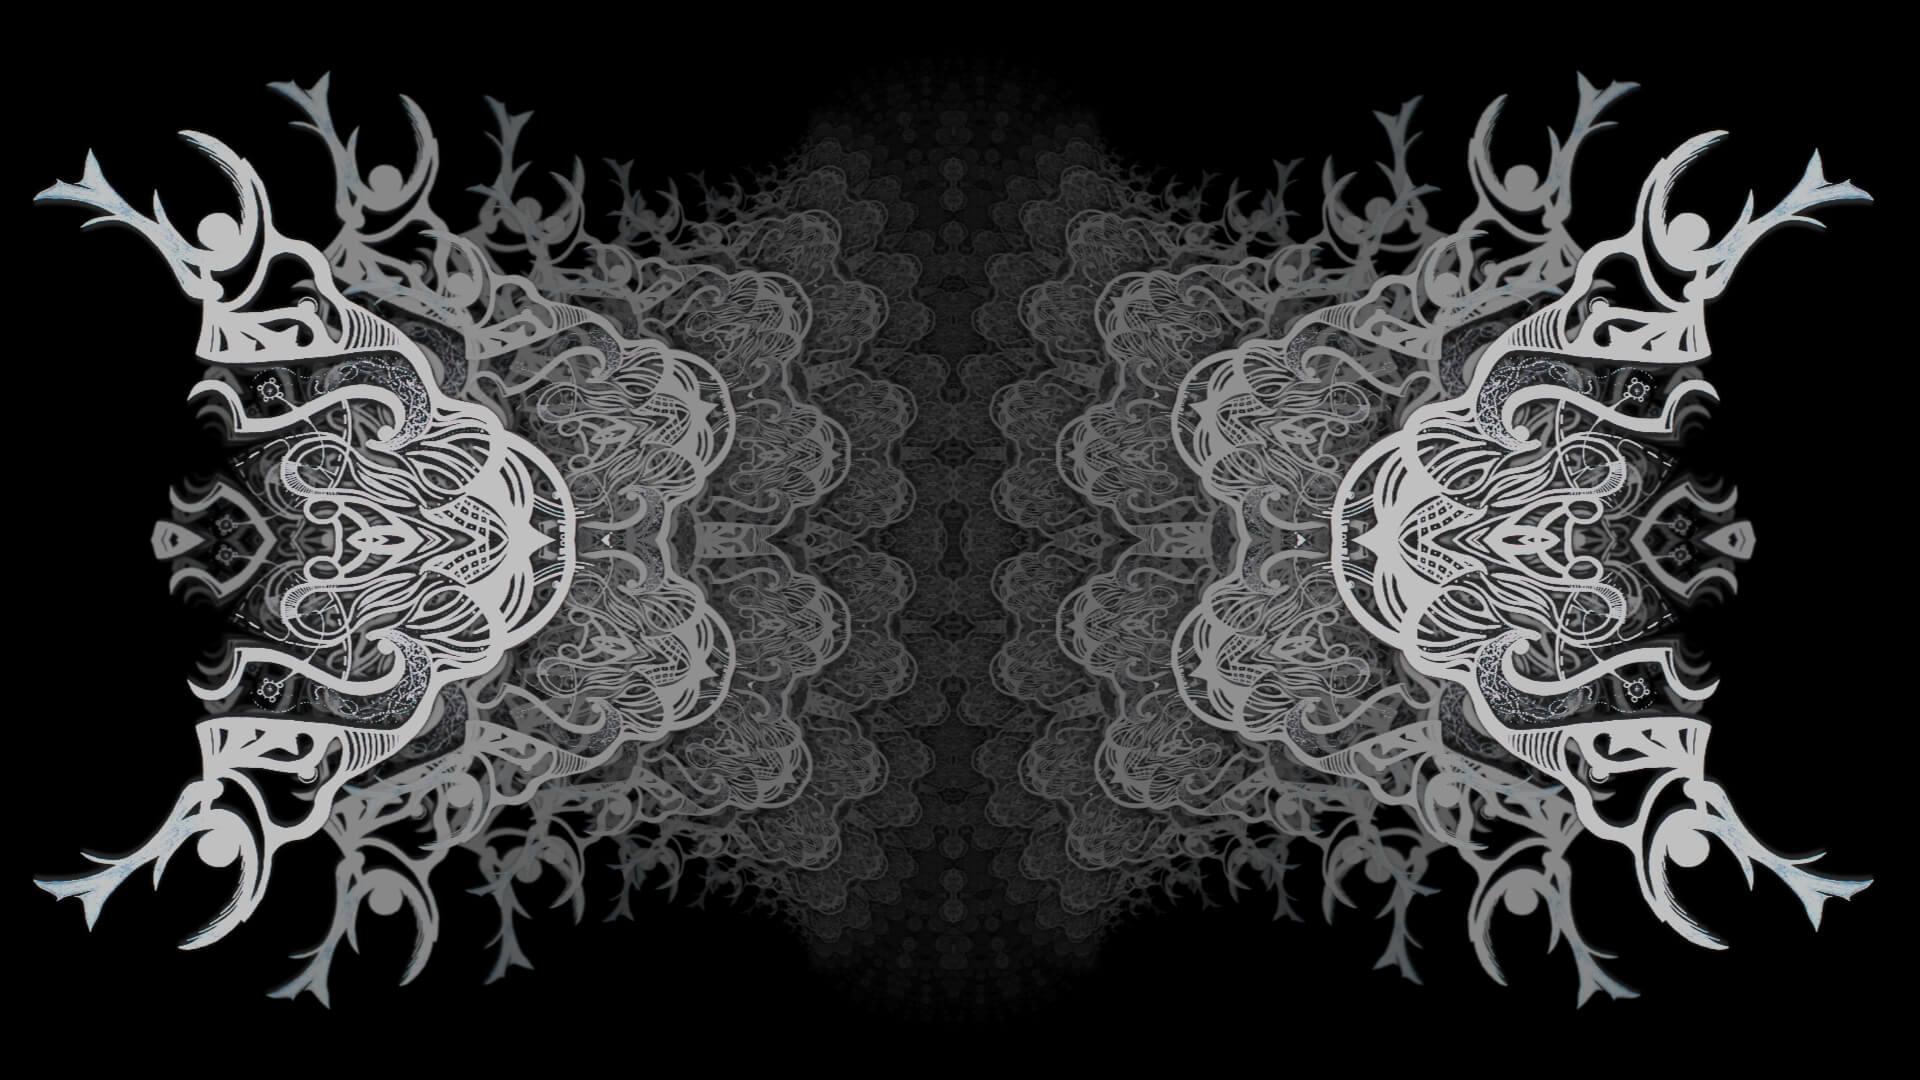 Soiled white sheet - digital abstract art by Mitek